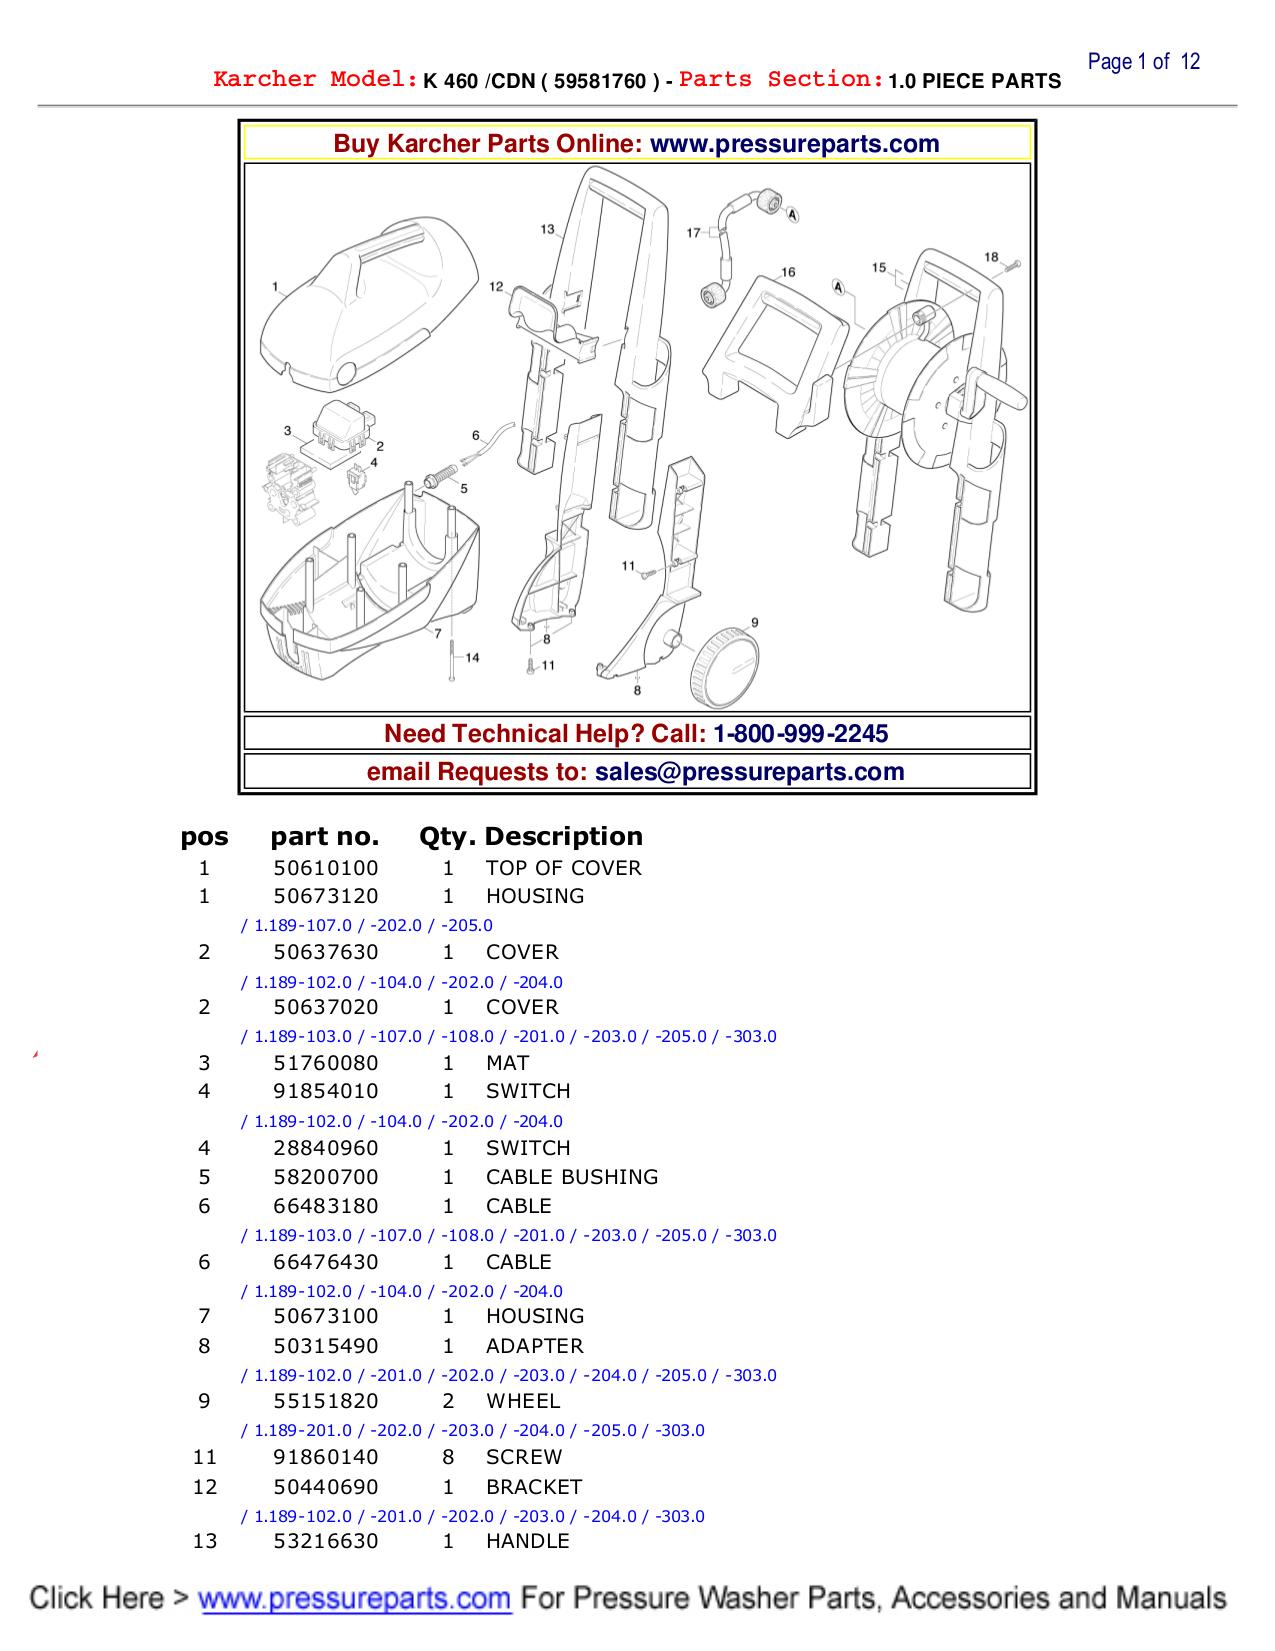 Download free pdf for Karcher K 460 Pressure Washers Other